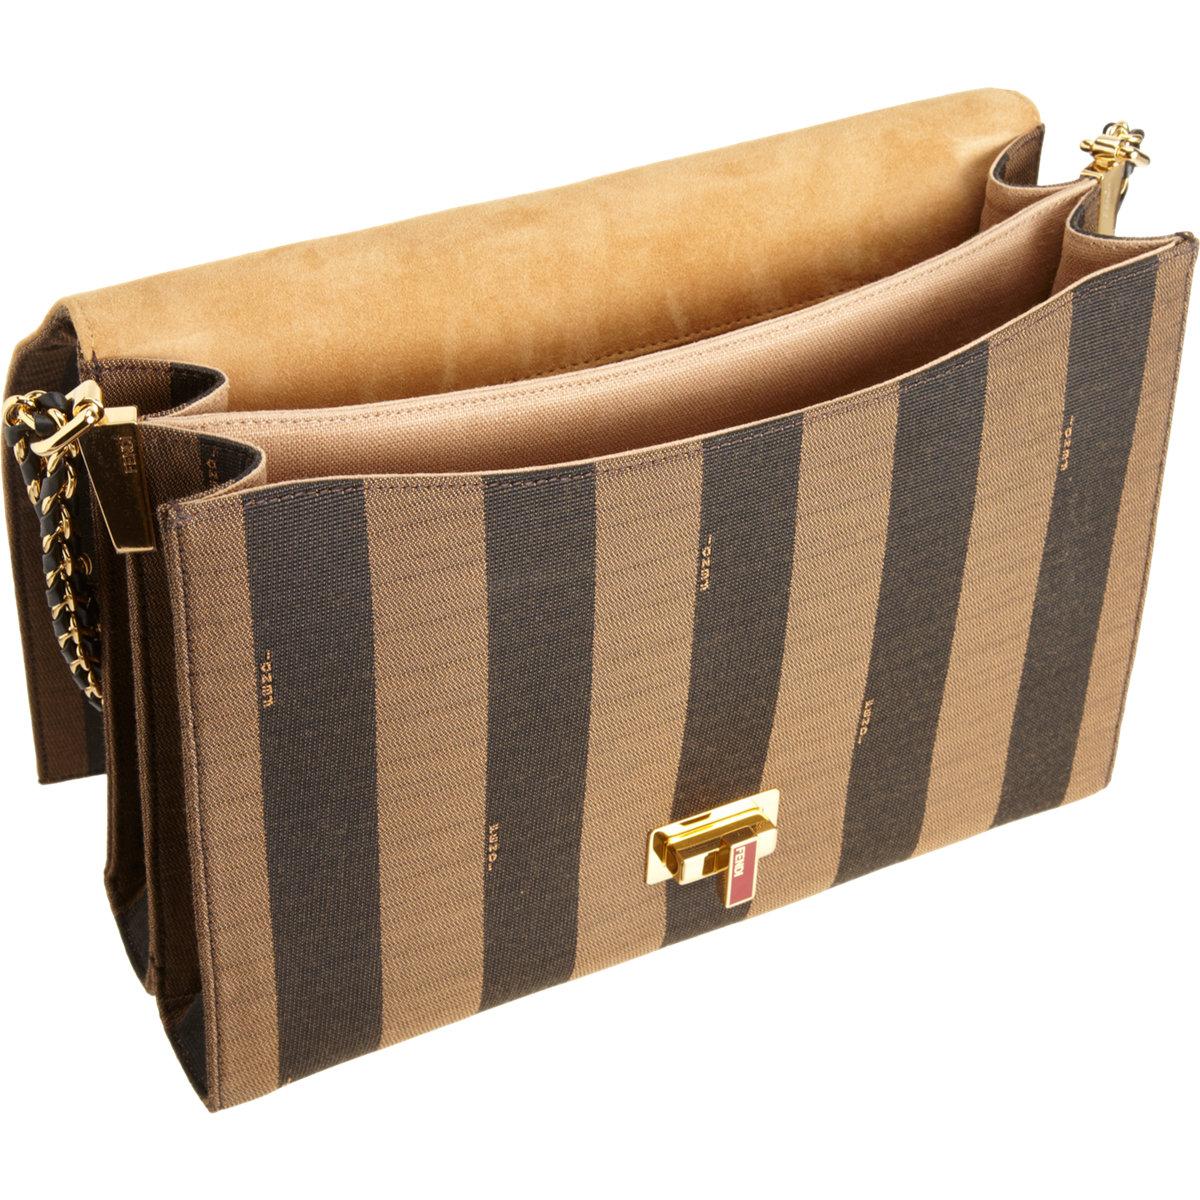 661eed2ac96 ... sale fendi large pequin stripe claudia bag in brown lyst 717de e346a